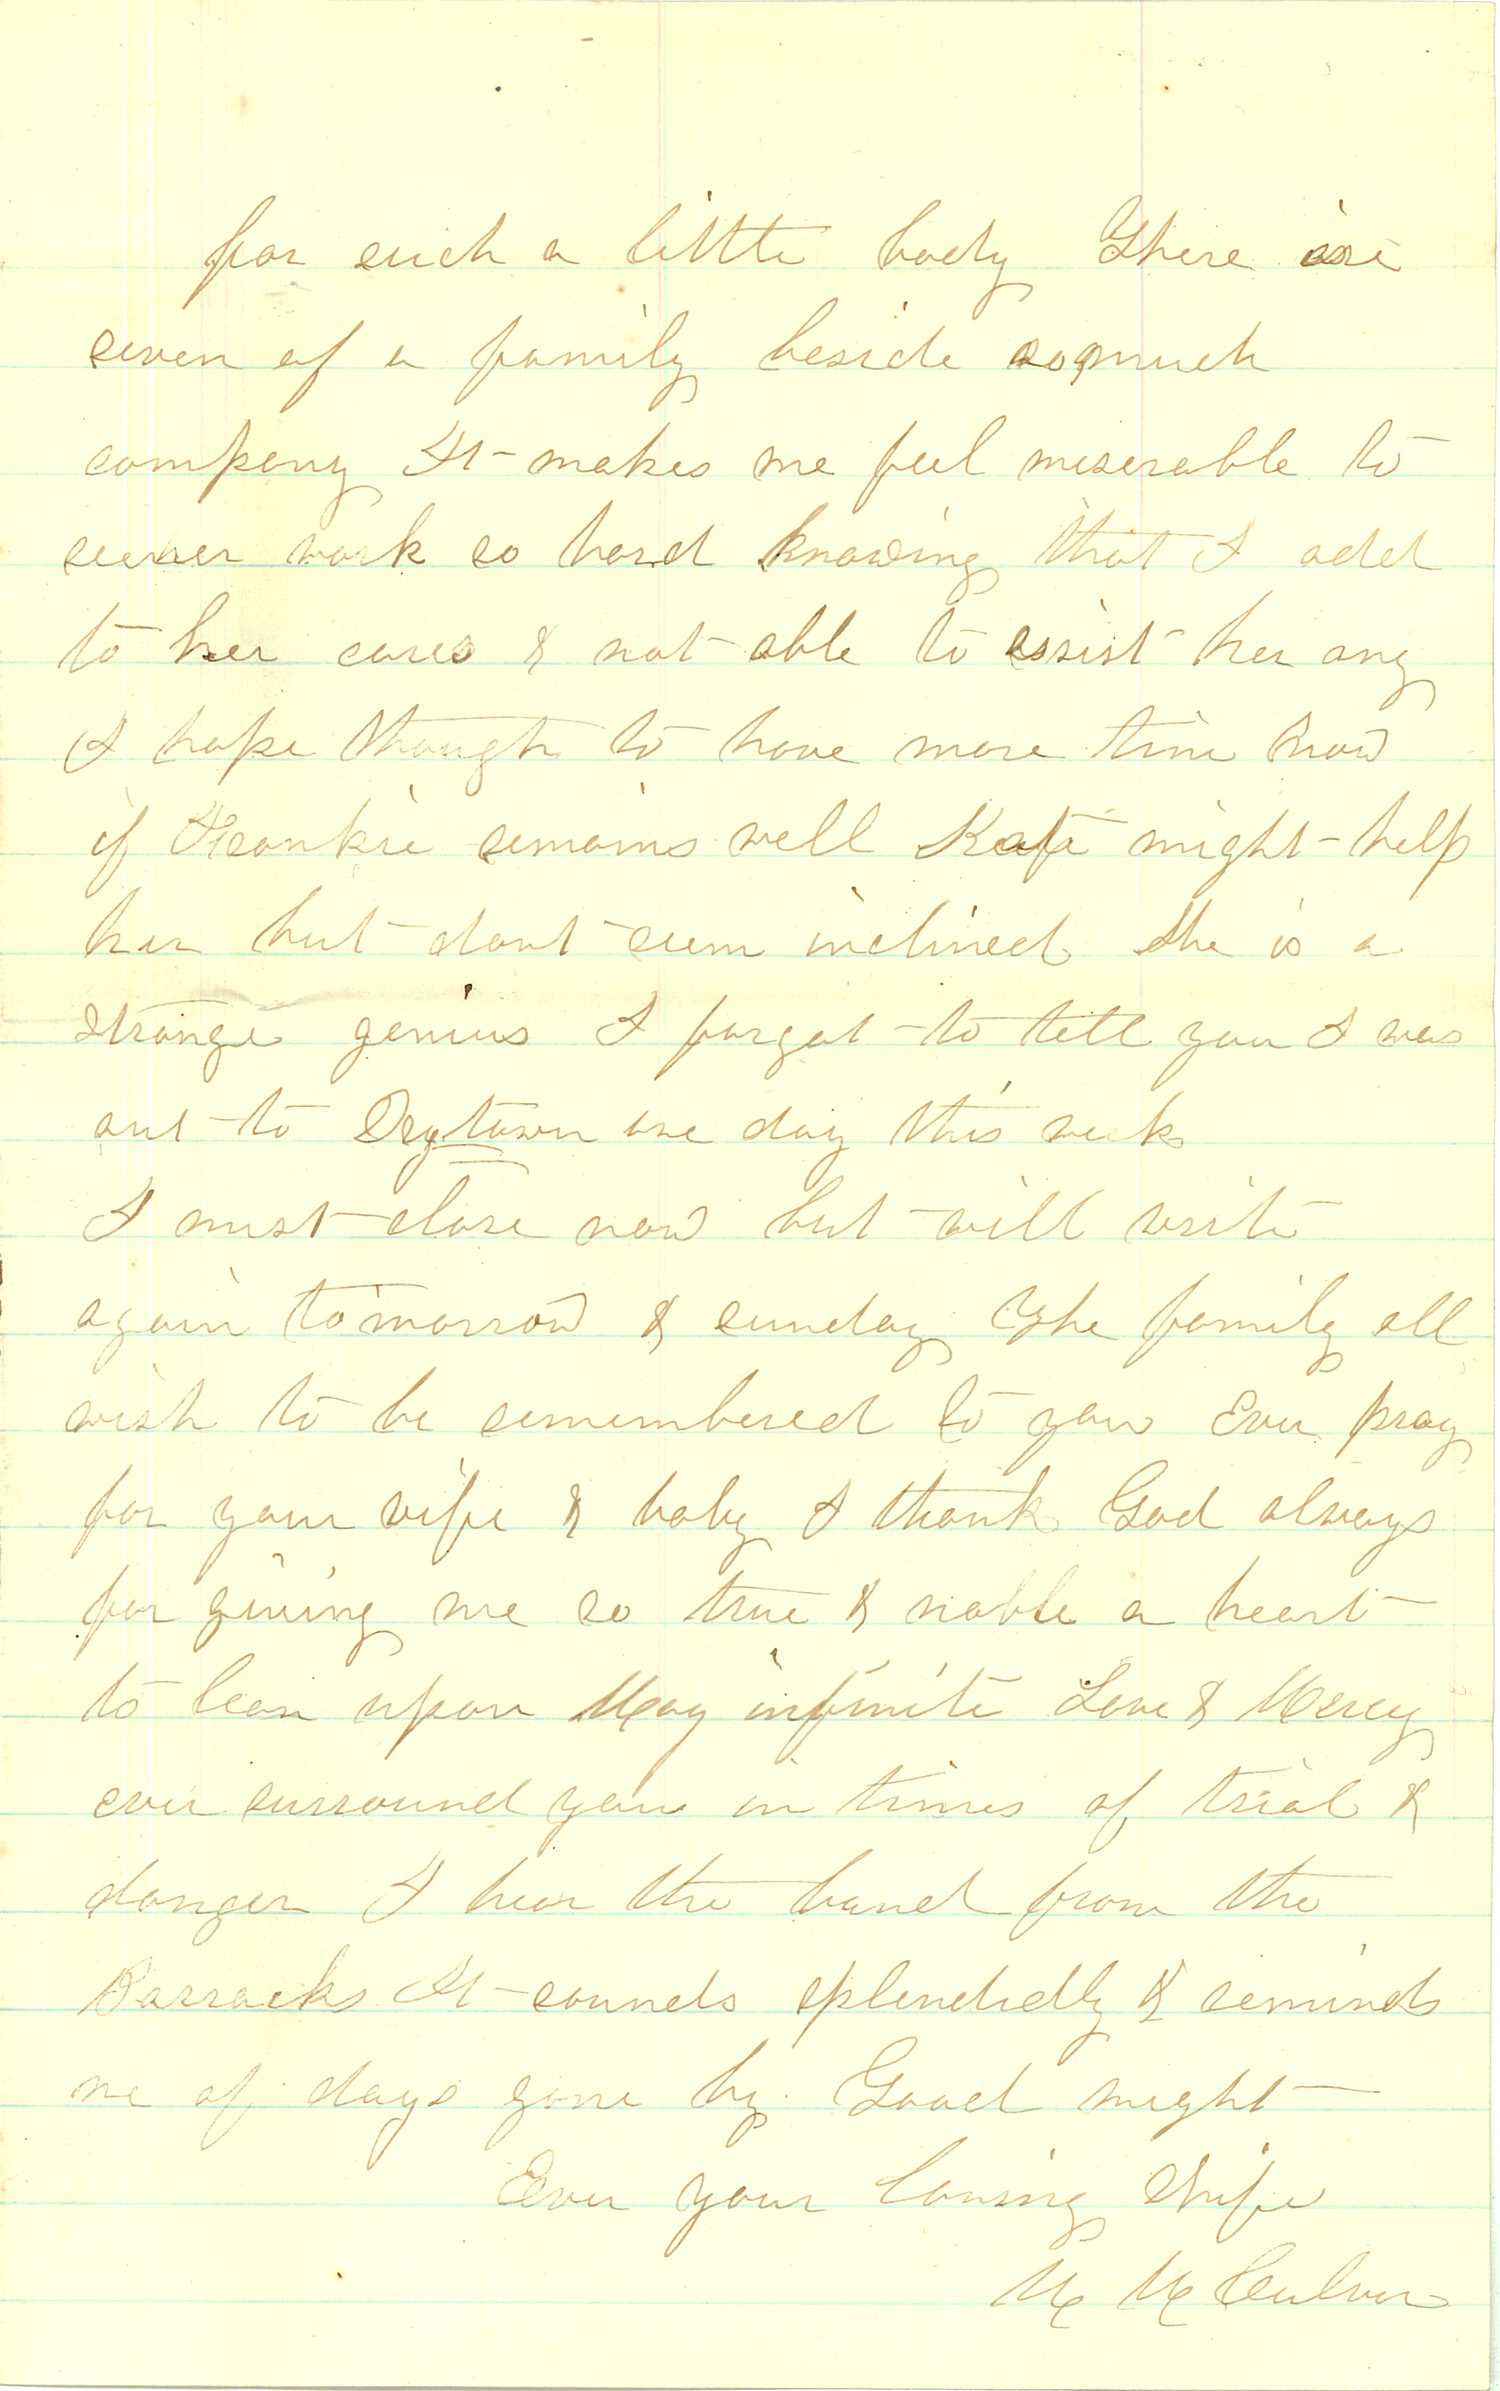 Joseph Culver Letter, September 4, 1863, Page 3